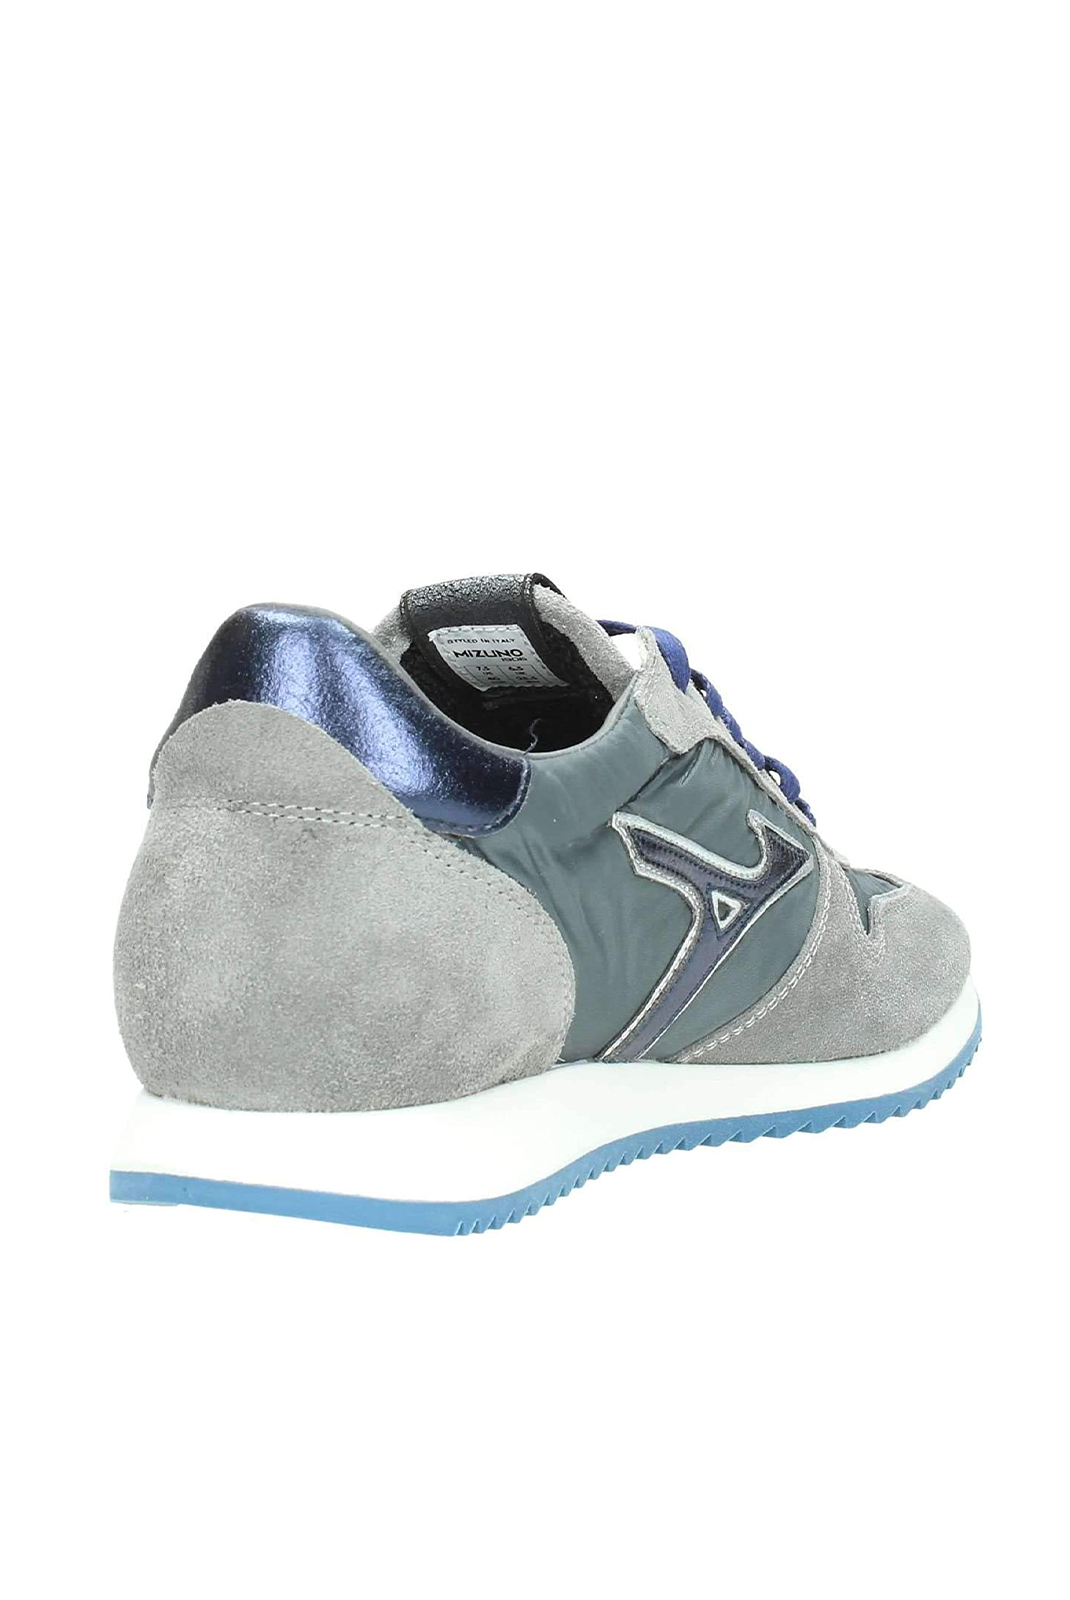 Chaussures   Mizuno D1GE181227 ETAMIN 2 BLUE/GREY/GREY